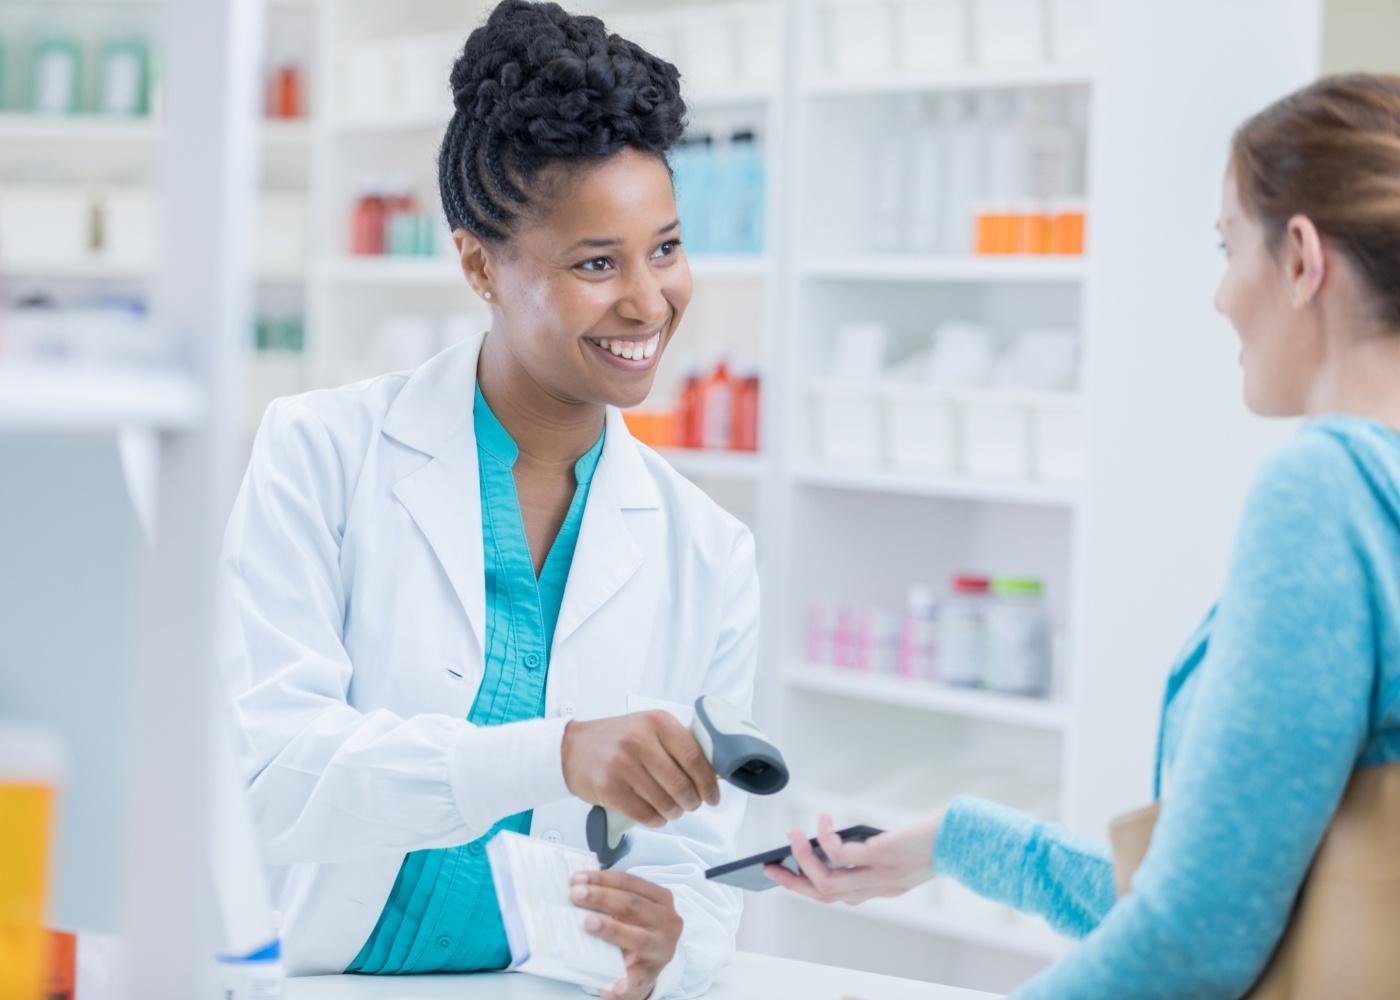 farmaceutica a ler receitas médicas no telemóvel